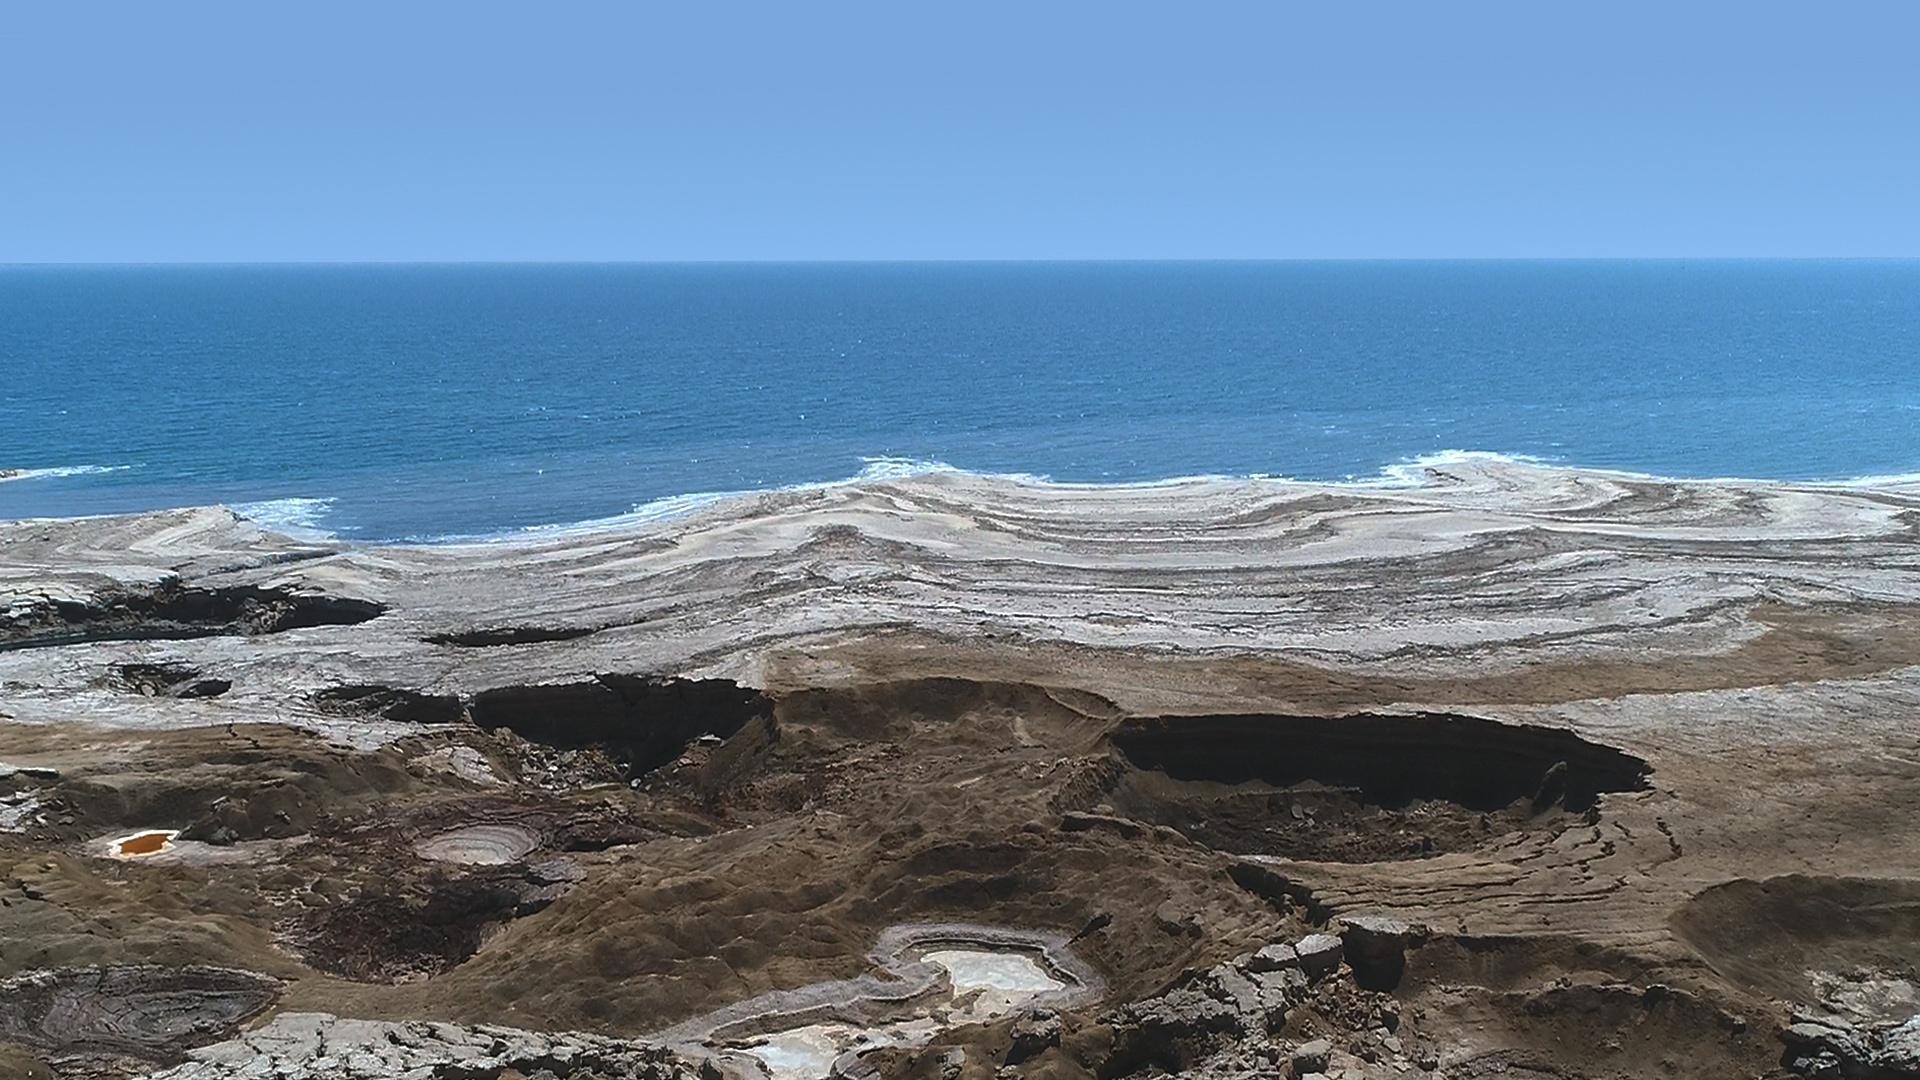 Saving the Dead Sea